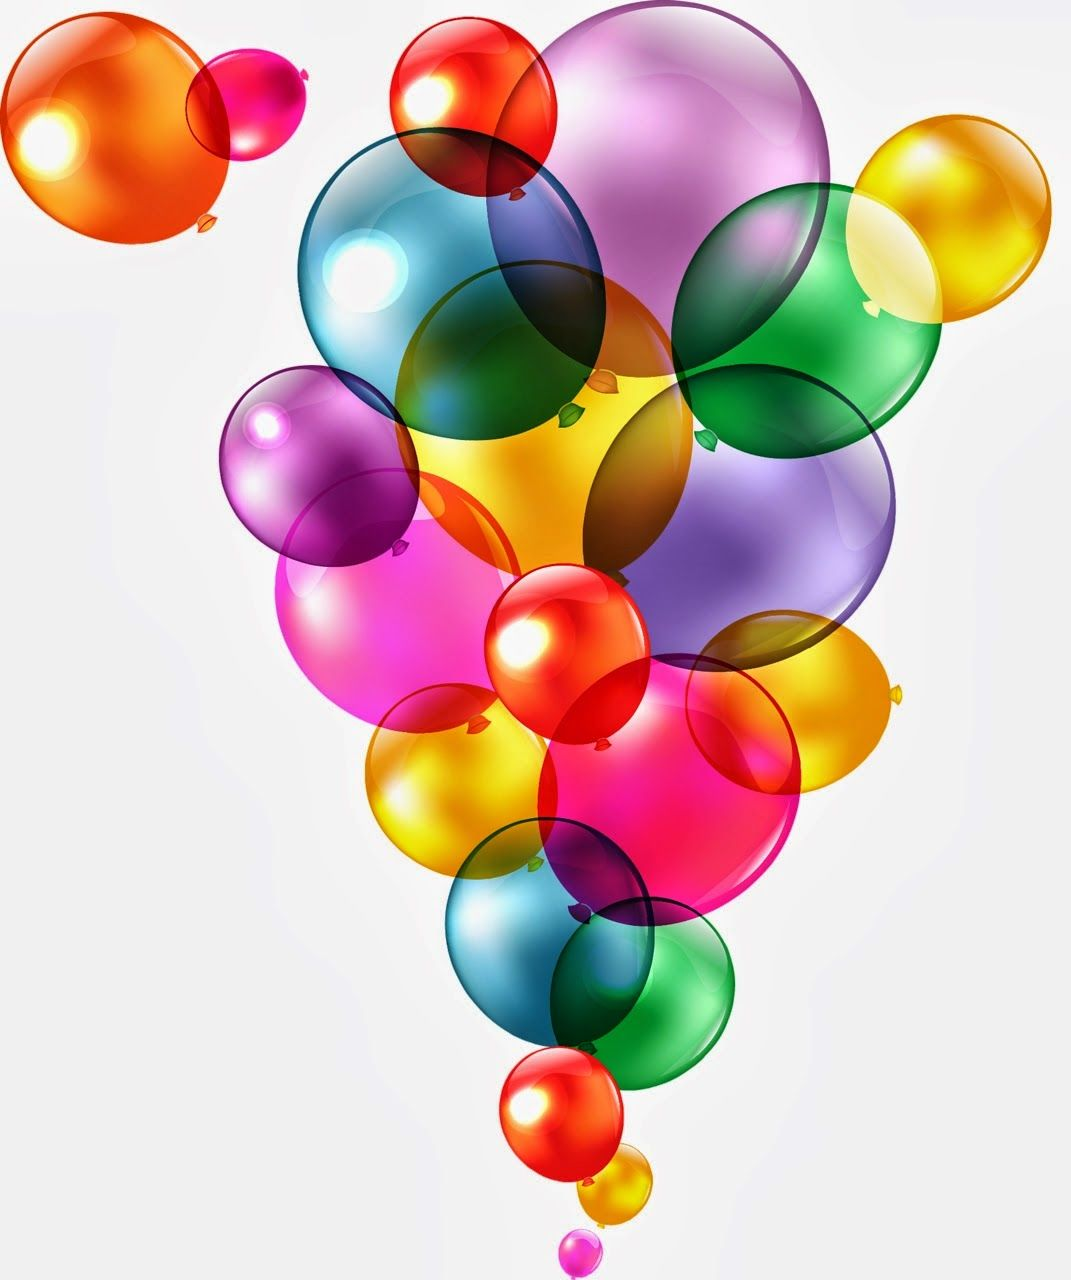 Fondos de cumplea os clipart png fondos de cumpleaños vintage - Buscar con Google | valentines stuff ... png